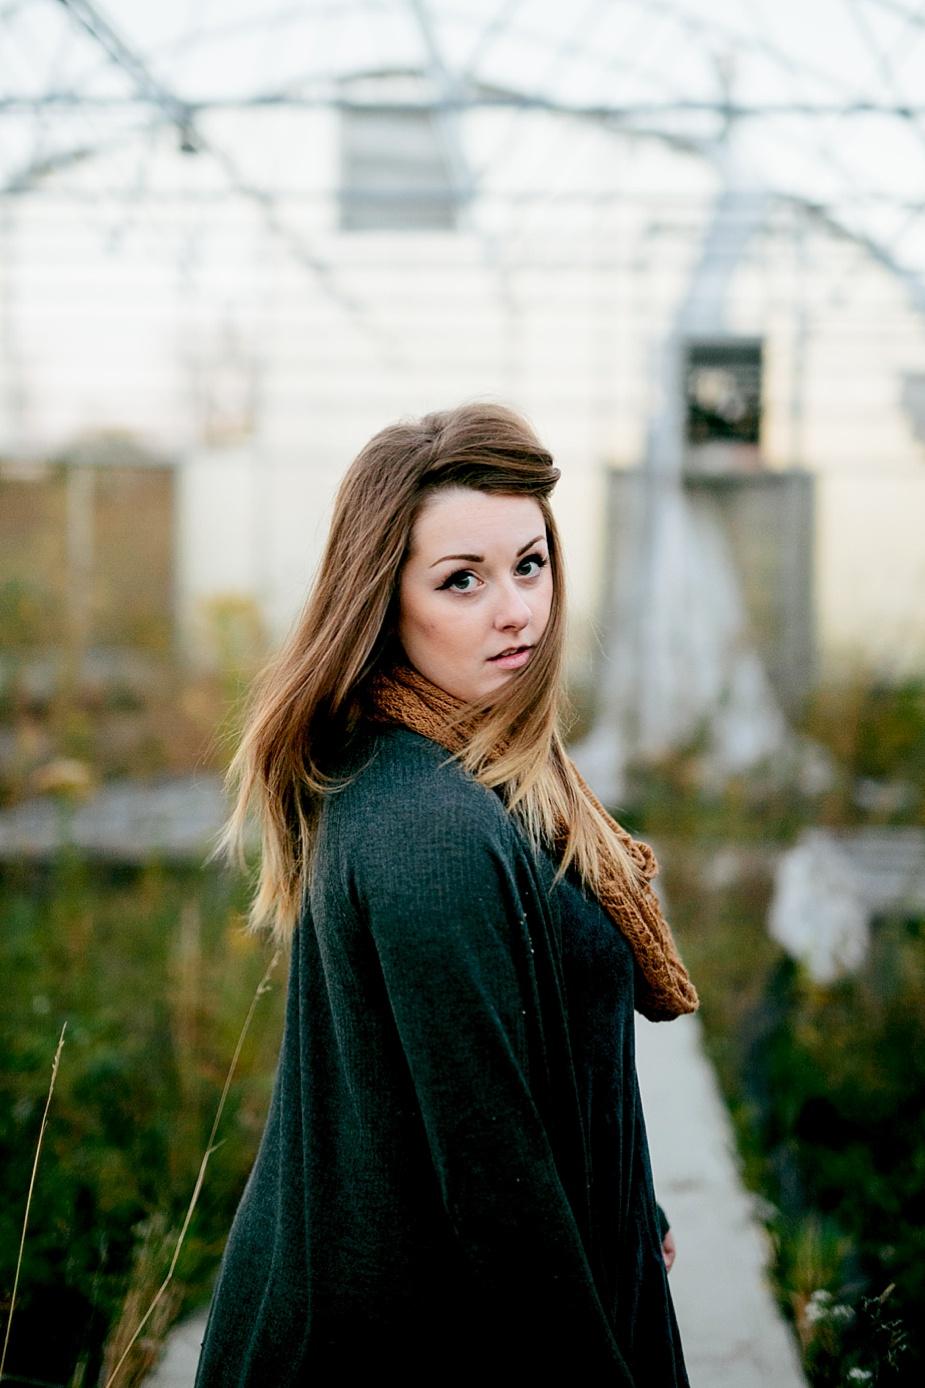 KelseyMurray-Milwaukee-Portrait-Photographer_0016.jpg